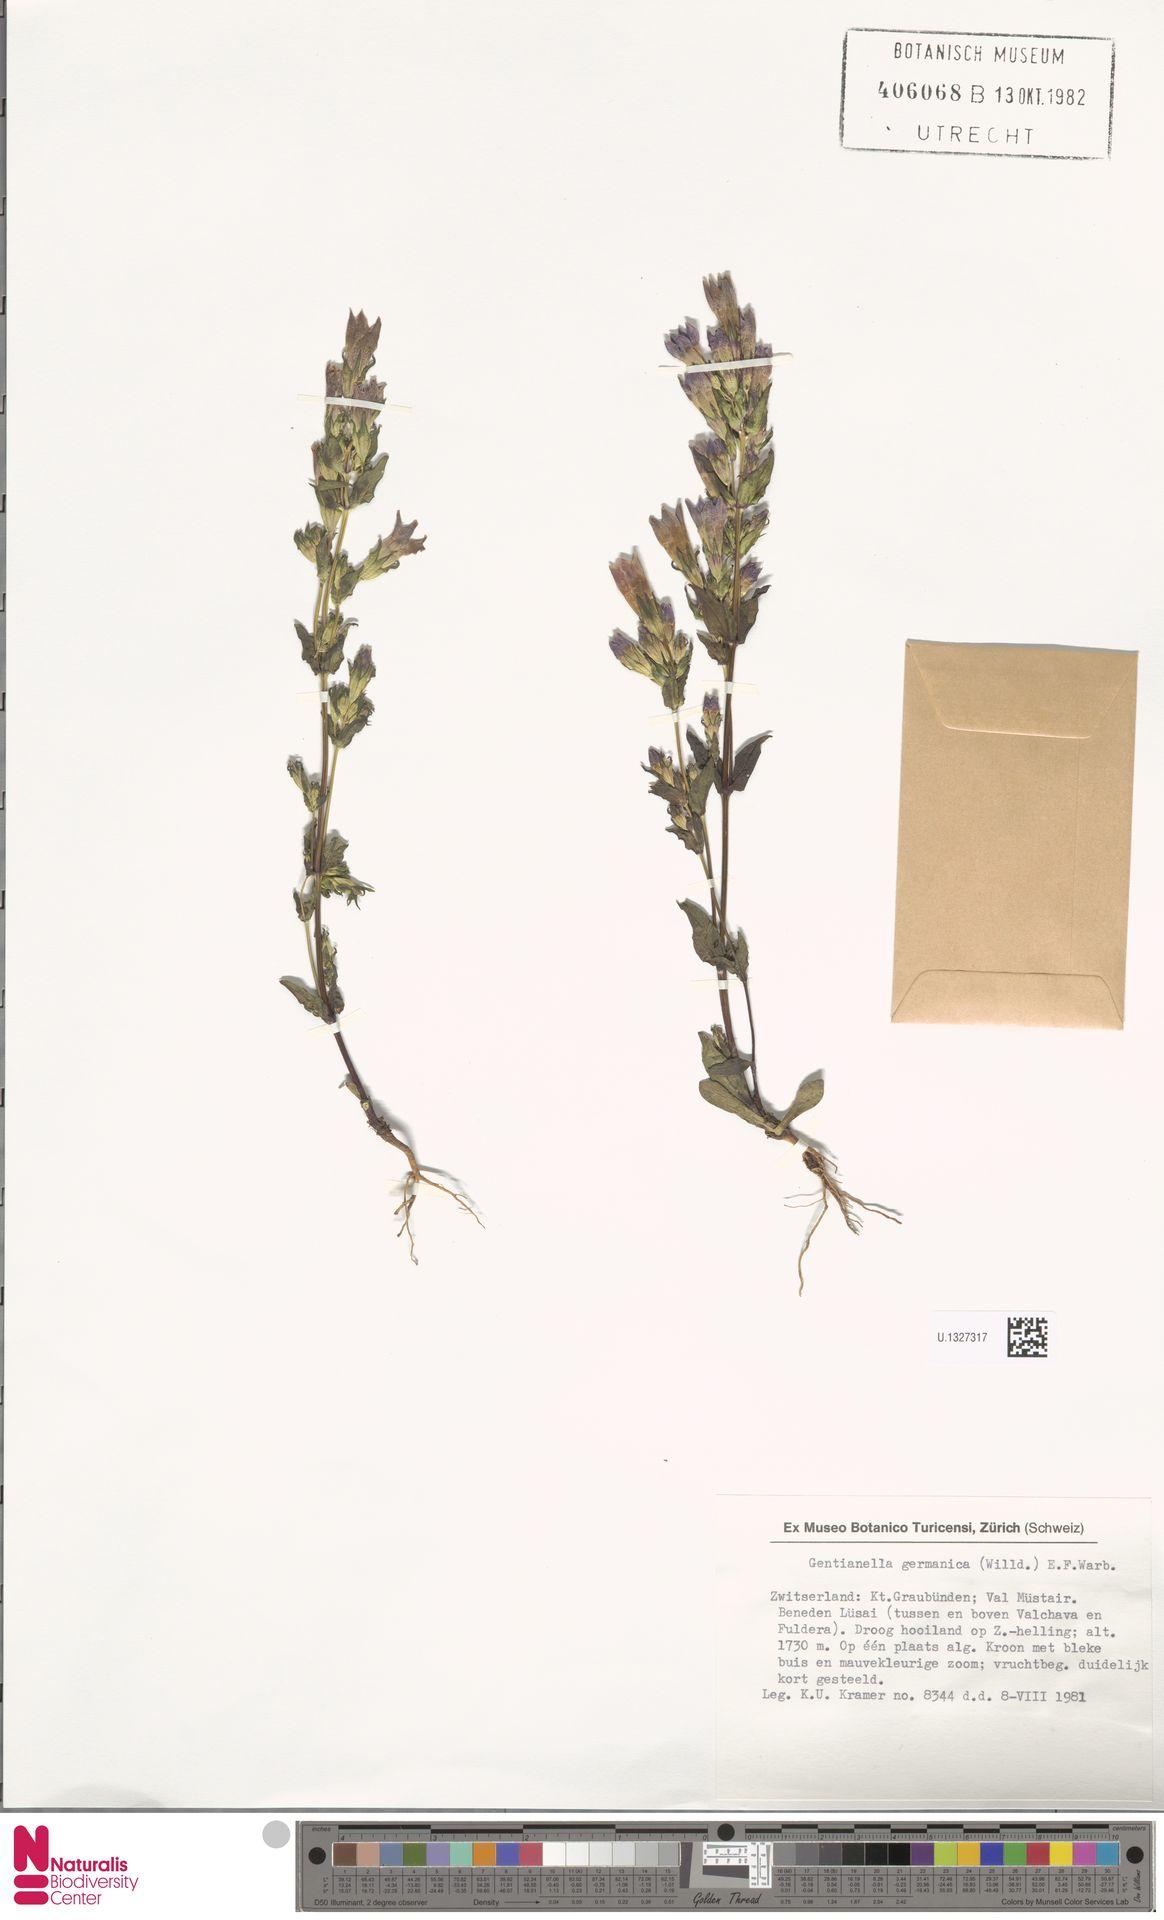 U.1327317   Gentianella germanica (Willd.) E.F.Warb.